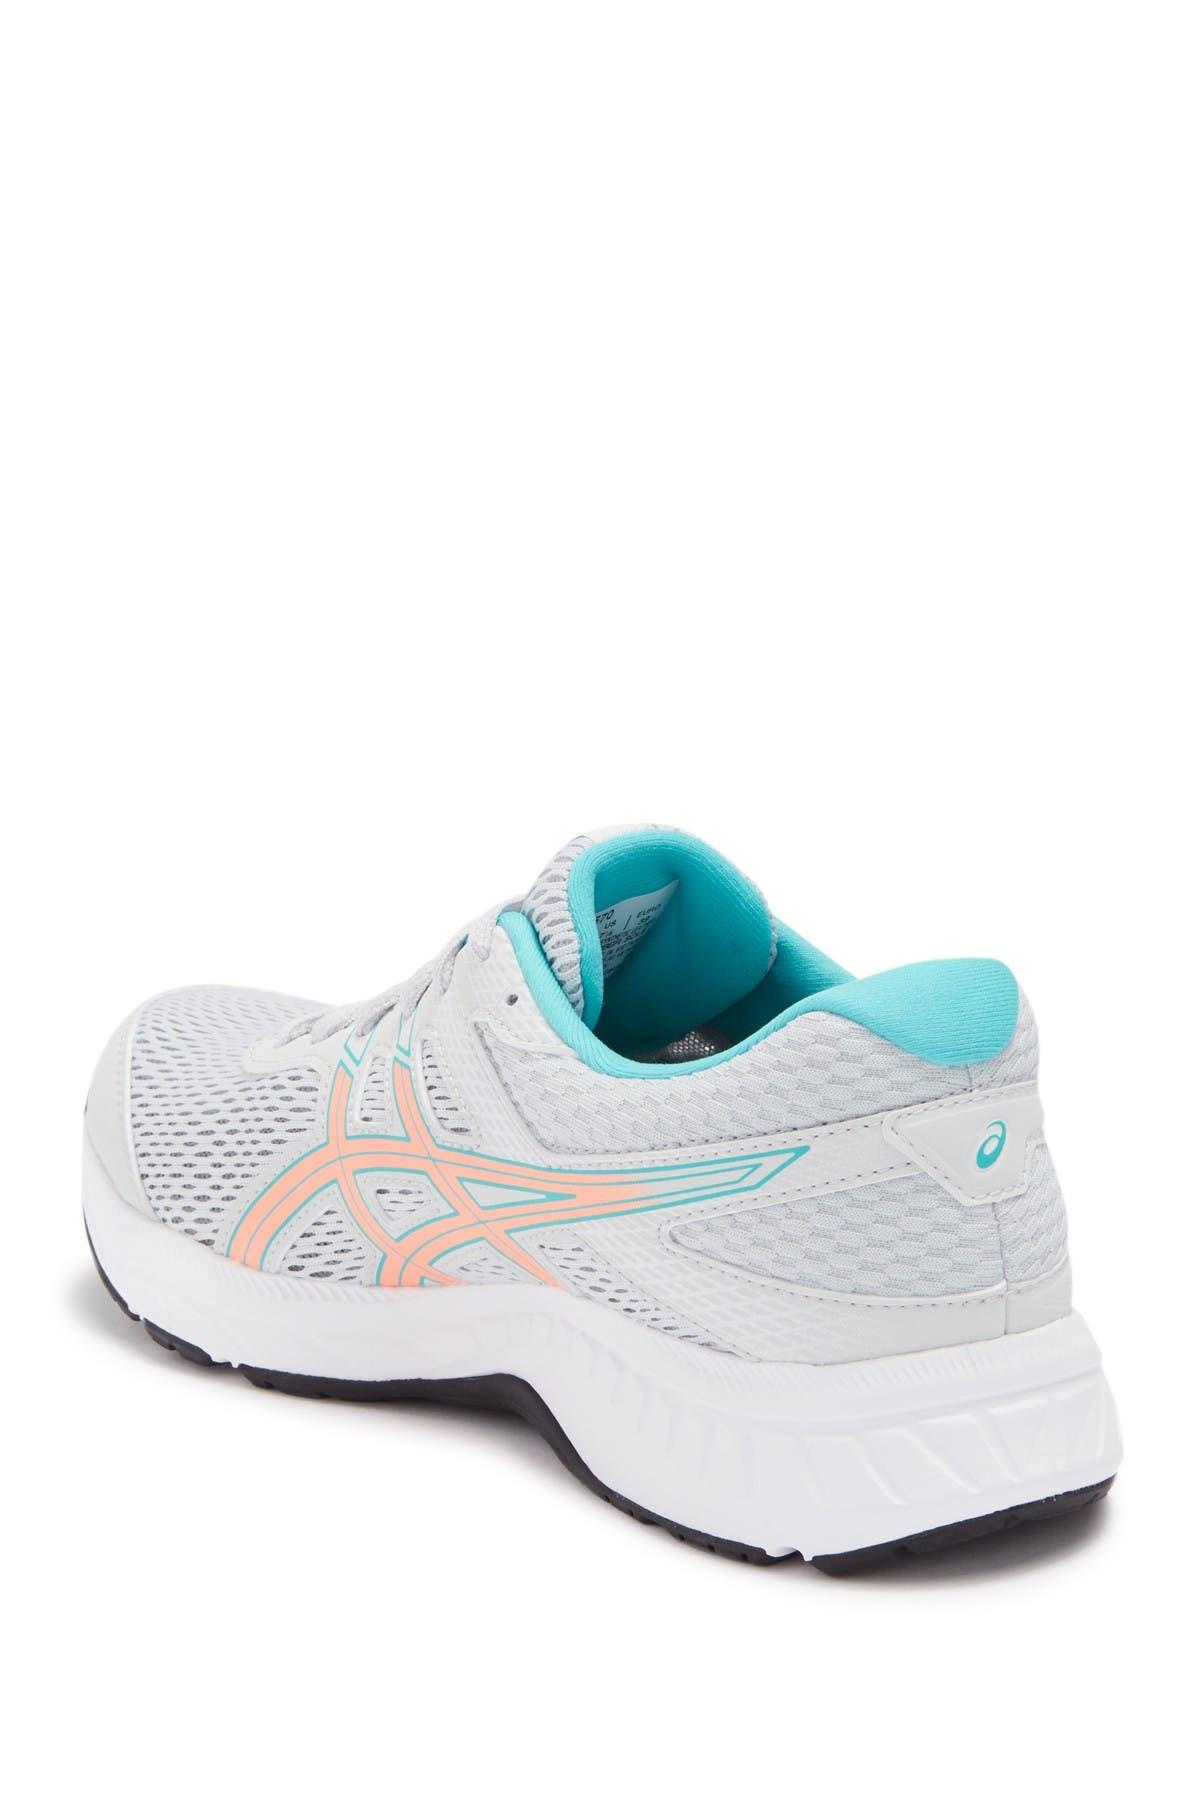 Image of ASICS GEL- Contend 6 Running Sneaker